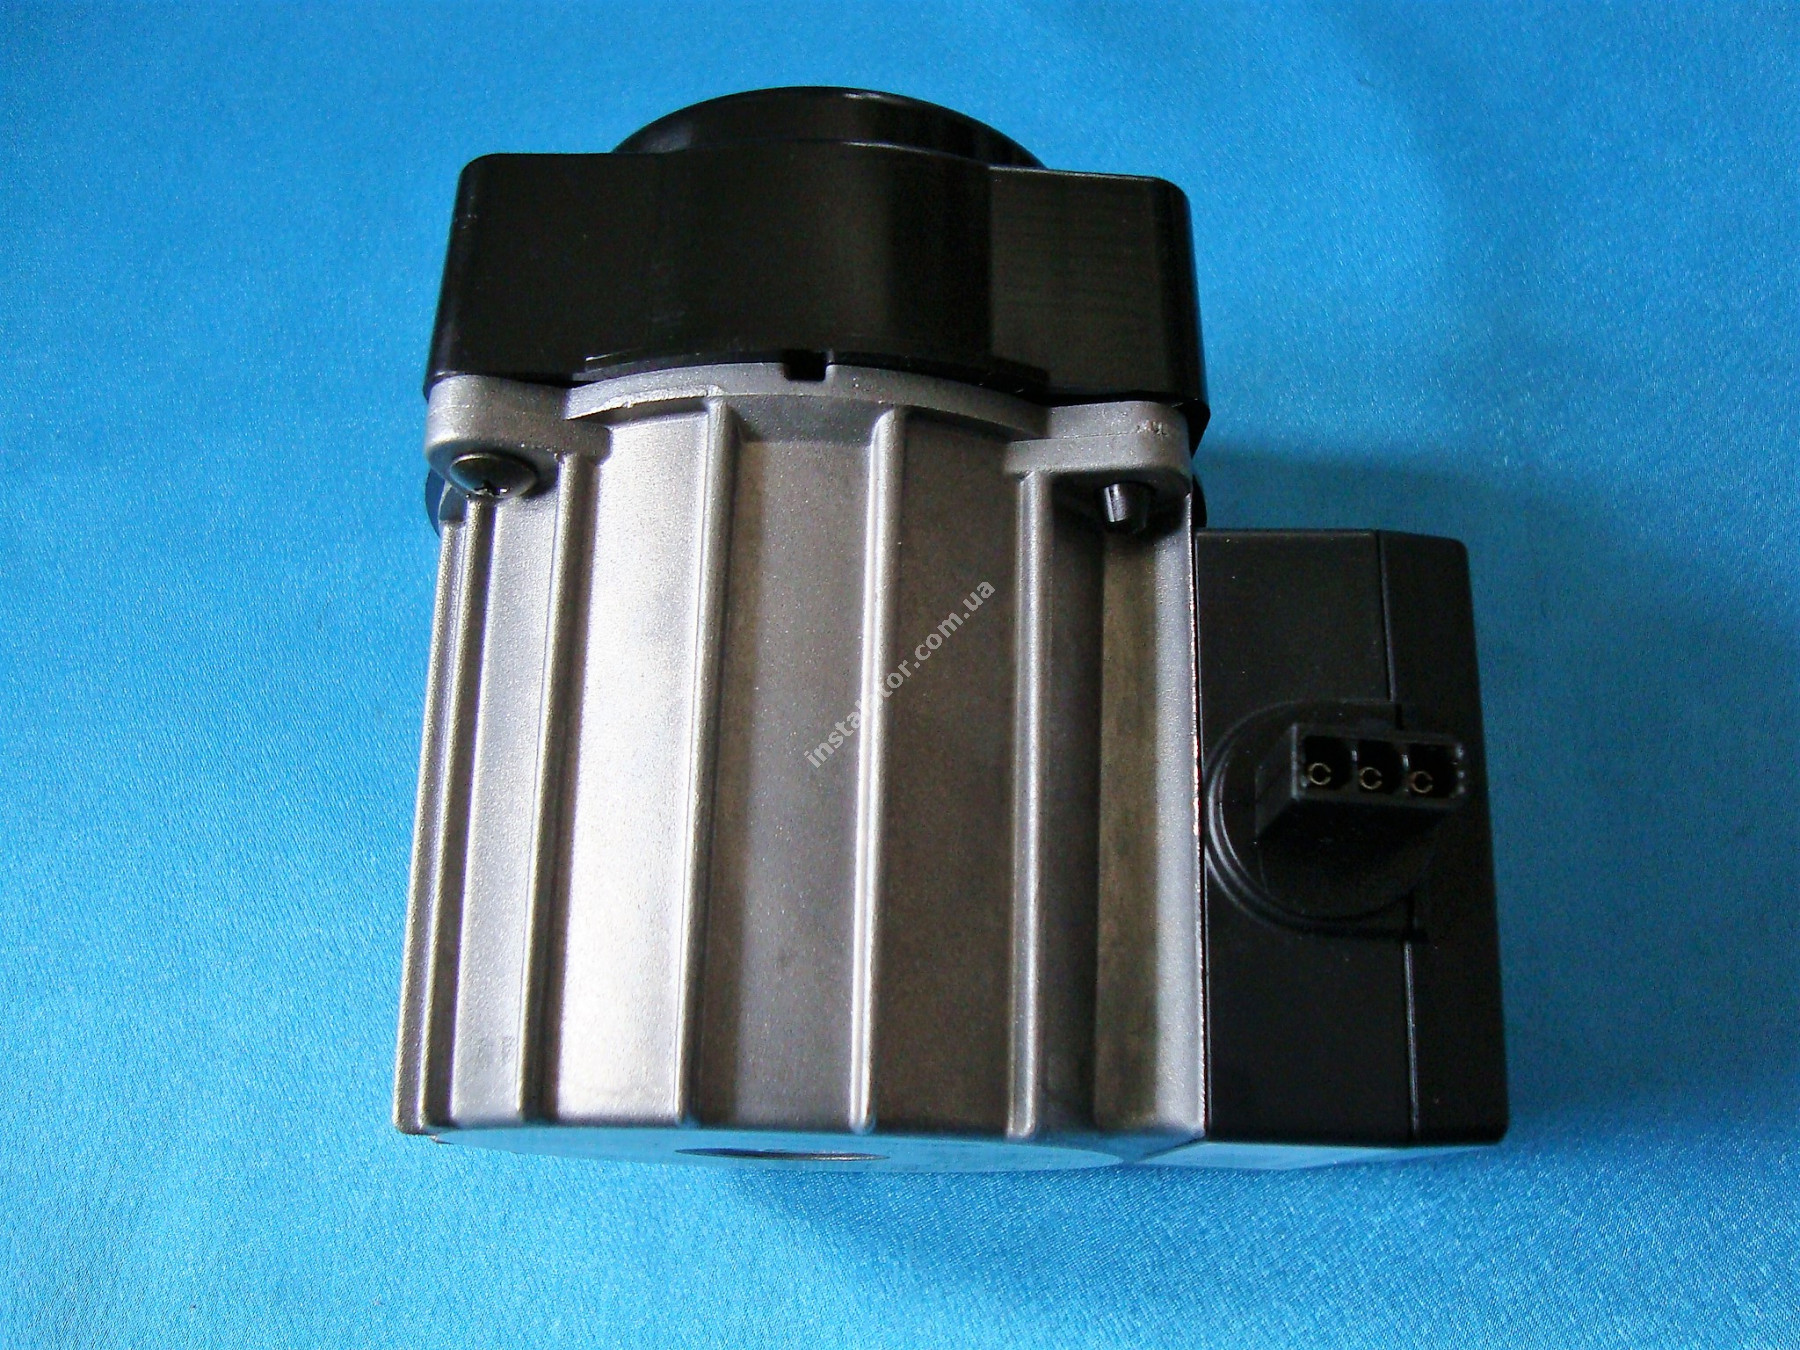 5192600 Циркуляційний насос SIME Dab VA 55 Format.Zip 25 OF - BF/Metropolis full-image-3